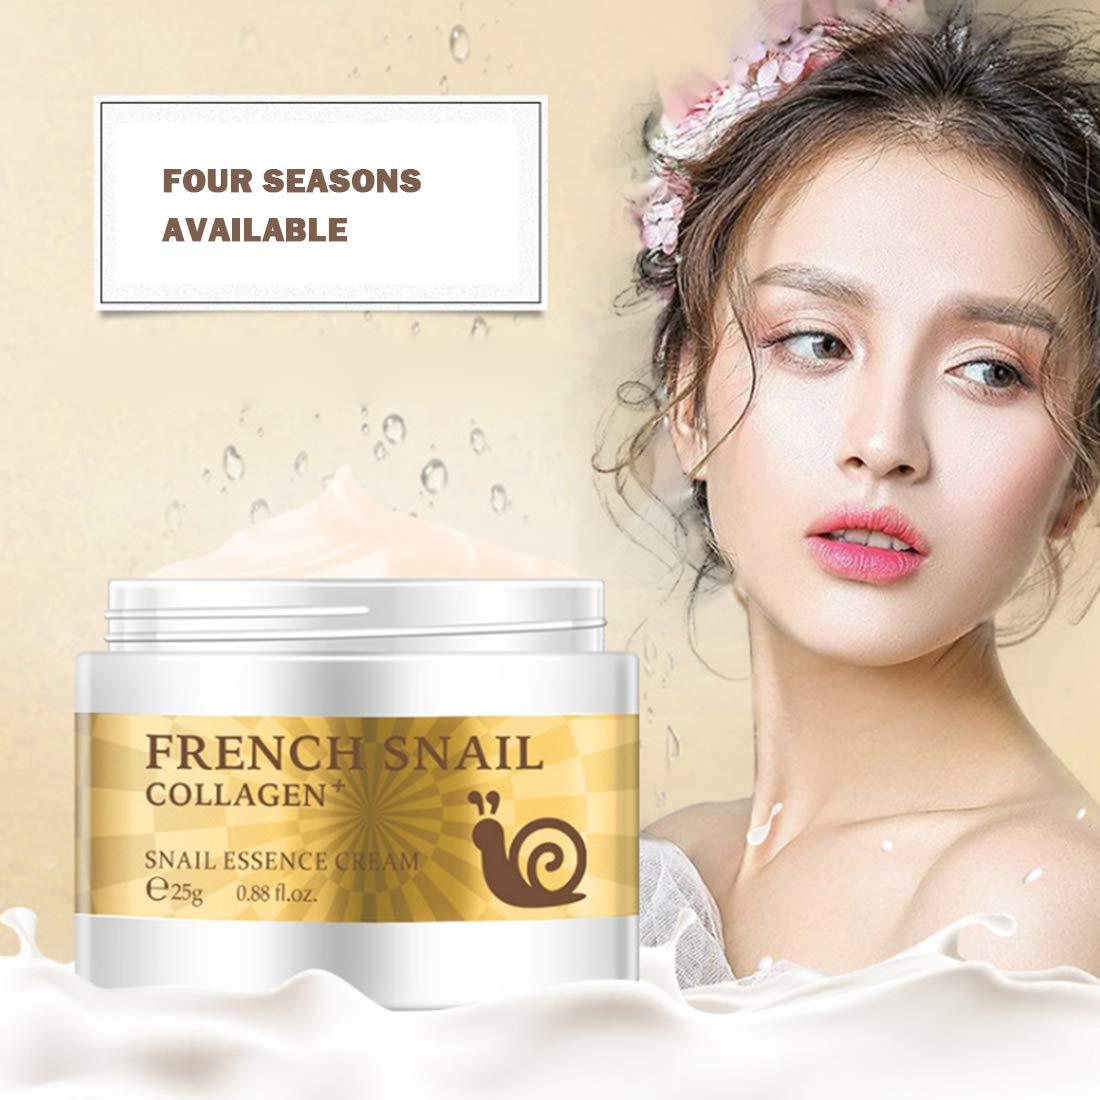 Loweryeah Snail Repair Anti-aging Cream 25g Collagen Moisturizing Nourish Repair Damaged Face Care Hyaluronic Acid Cream by Loweryeah (Image #2)